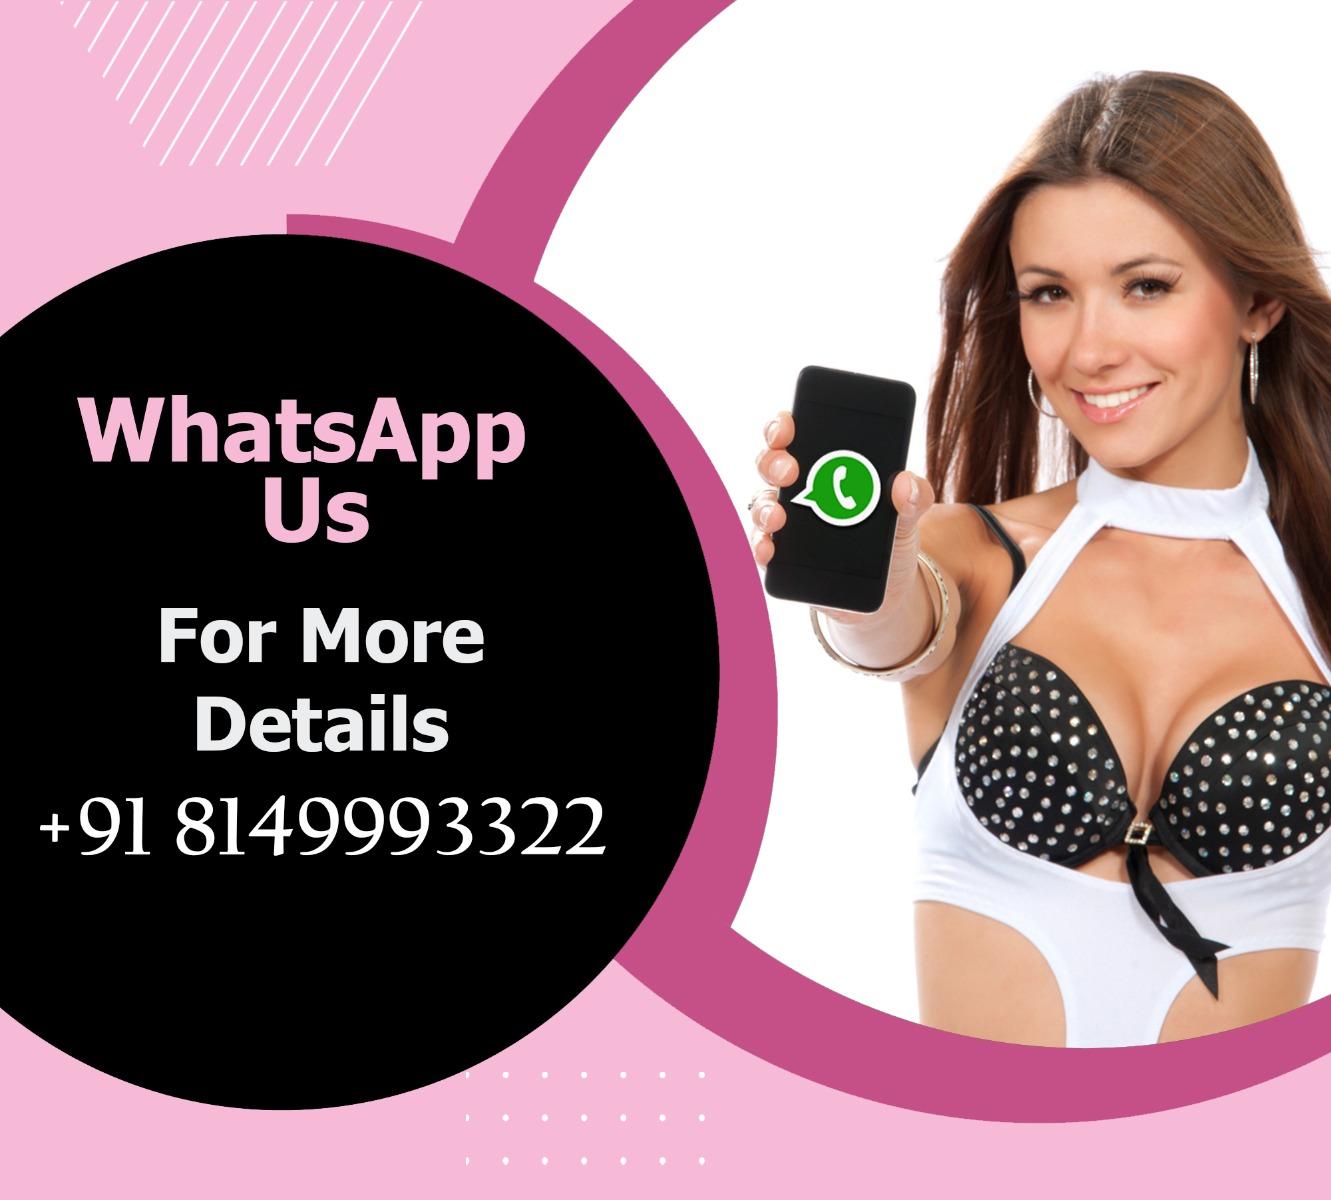 Kaamastra WhatsApp Number - 81499933322